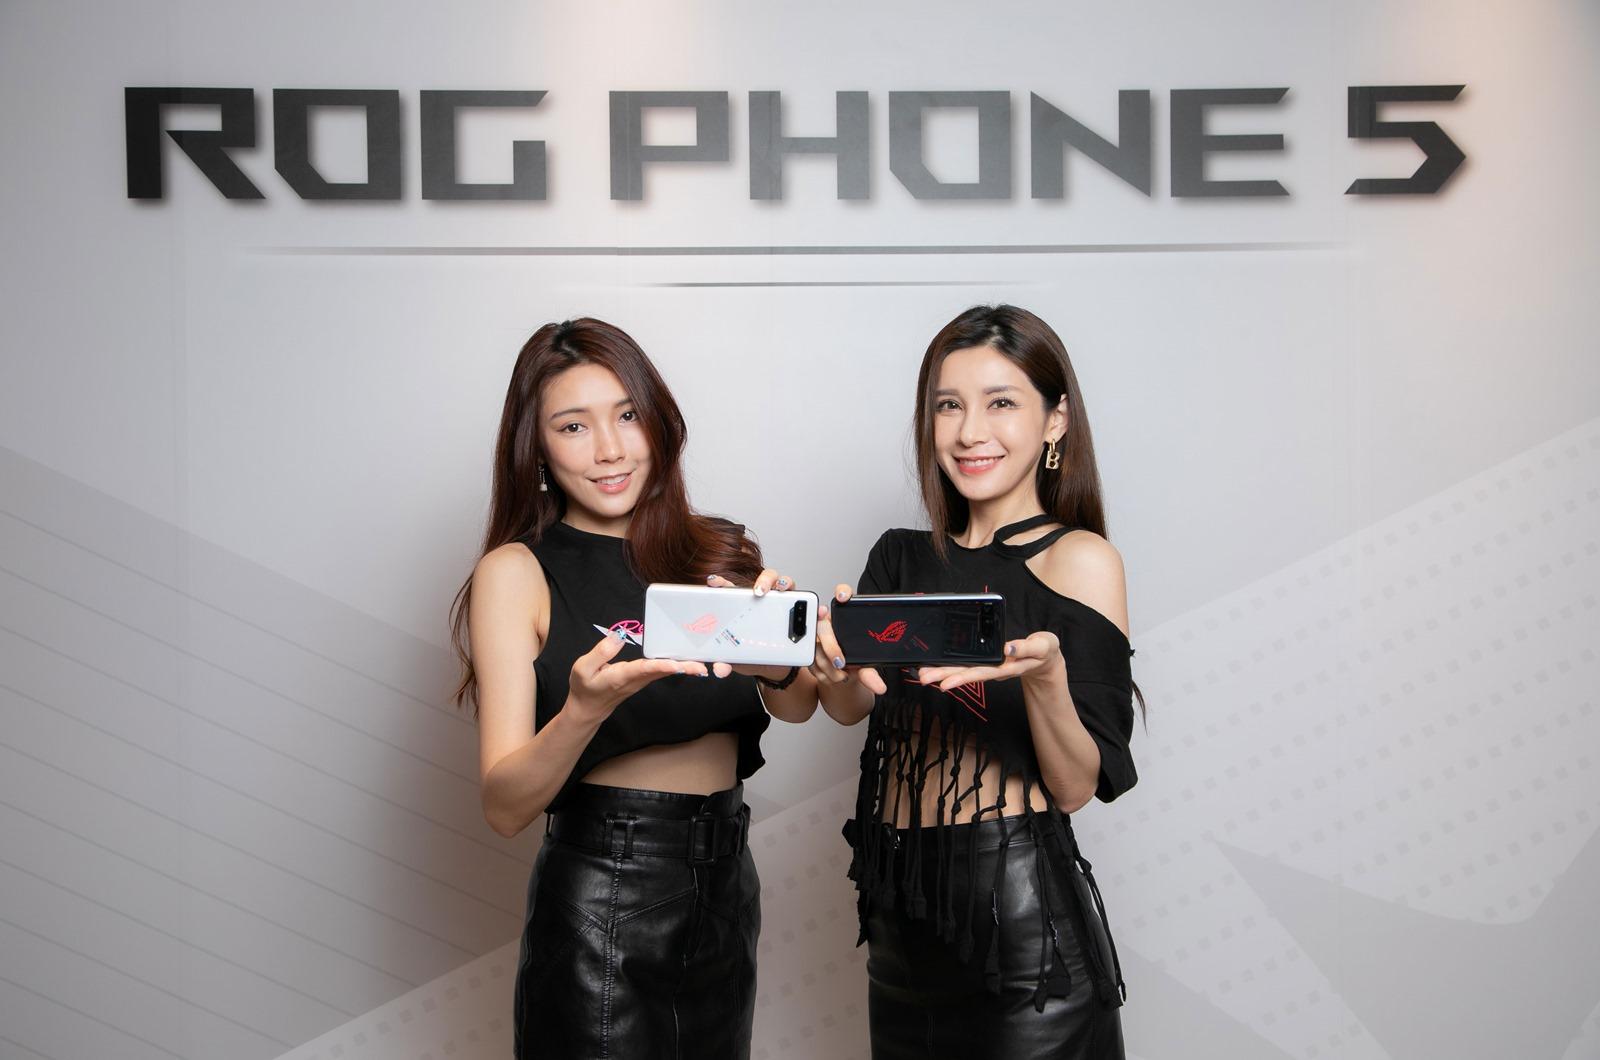 ROG-Phone-5 於 3 月 11 日中午 12 點起在全台華碩專賣店、專櫃店開賣,並於 ASUS-Store 與各大電商平台預購。.jpg @3C 達人廖阿輝